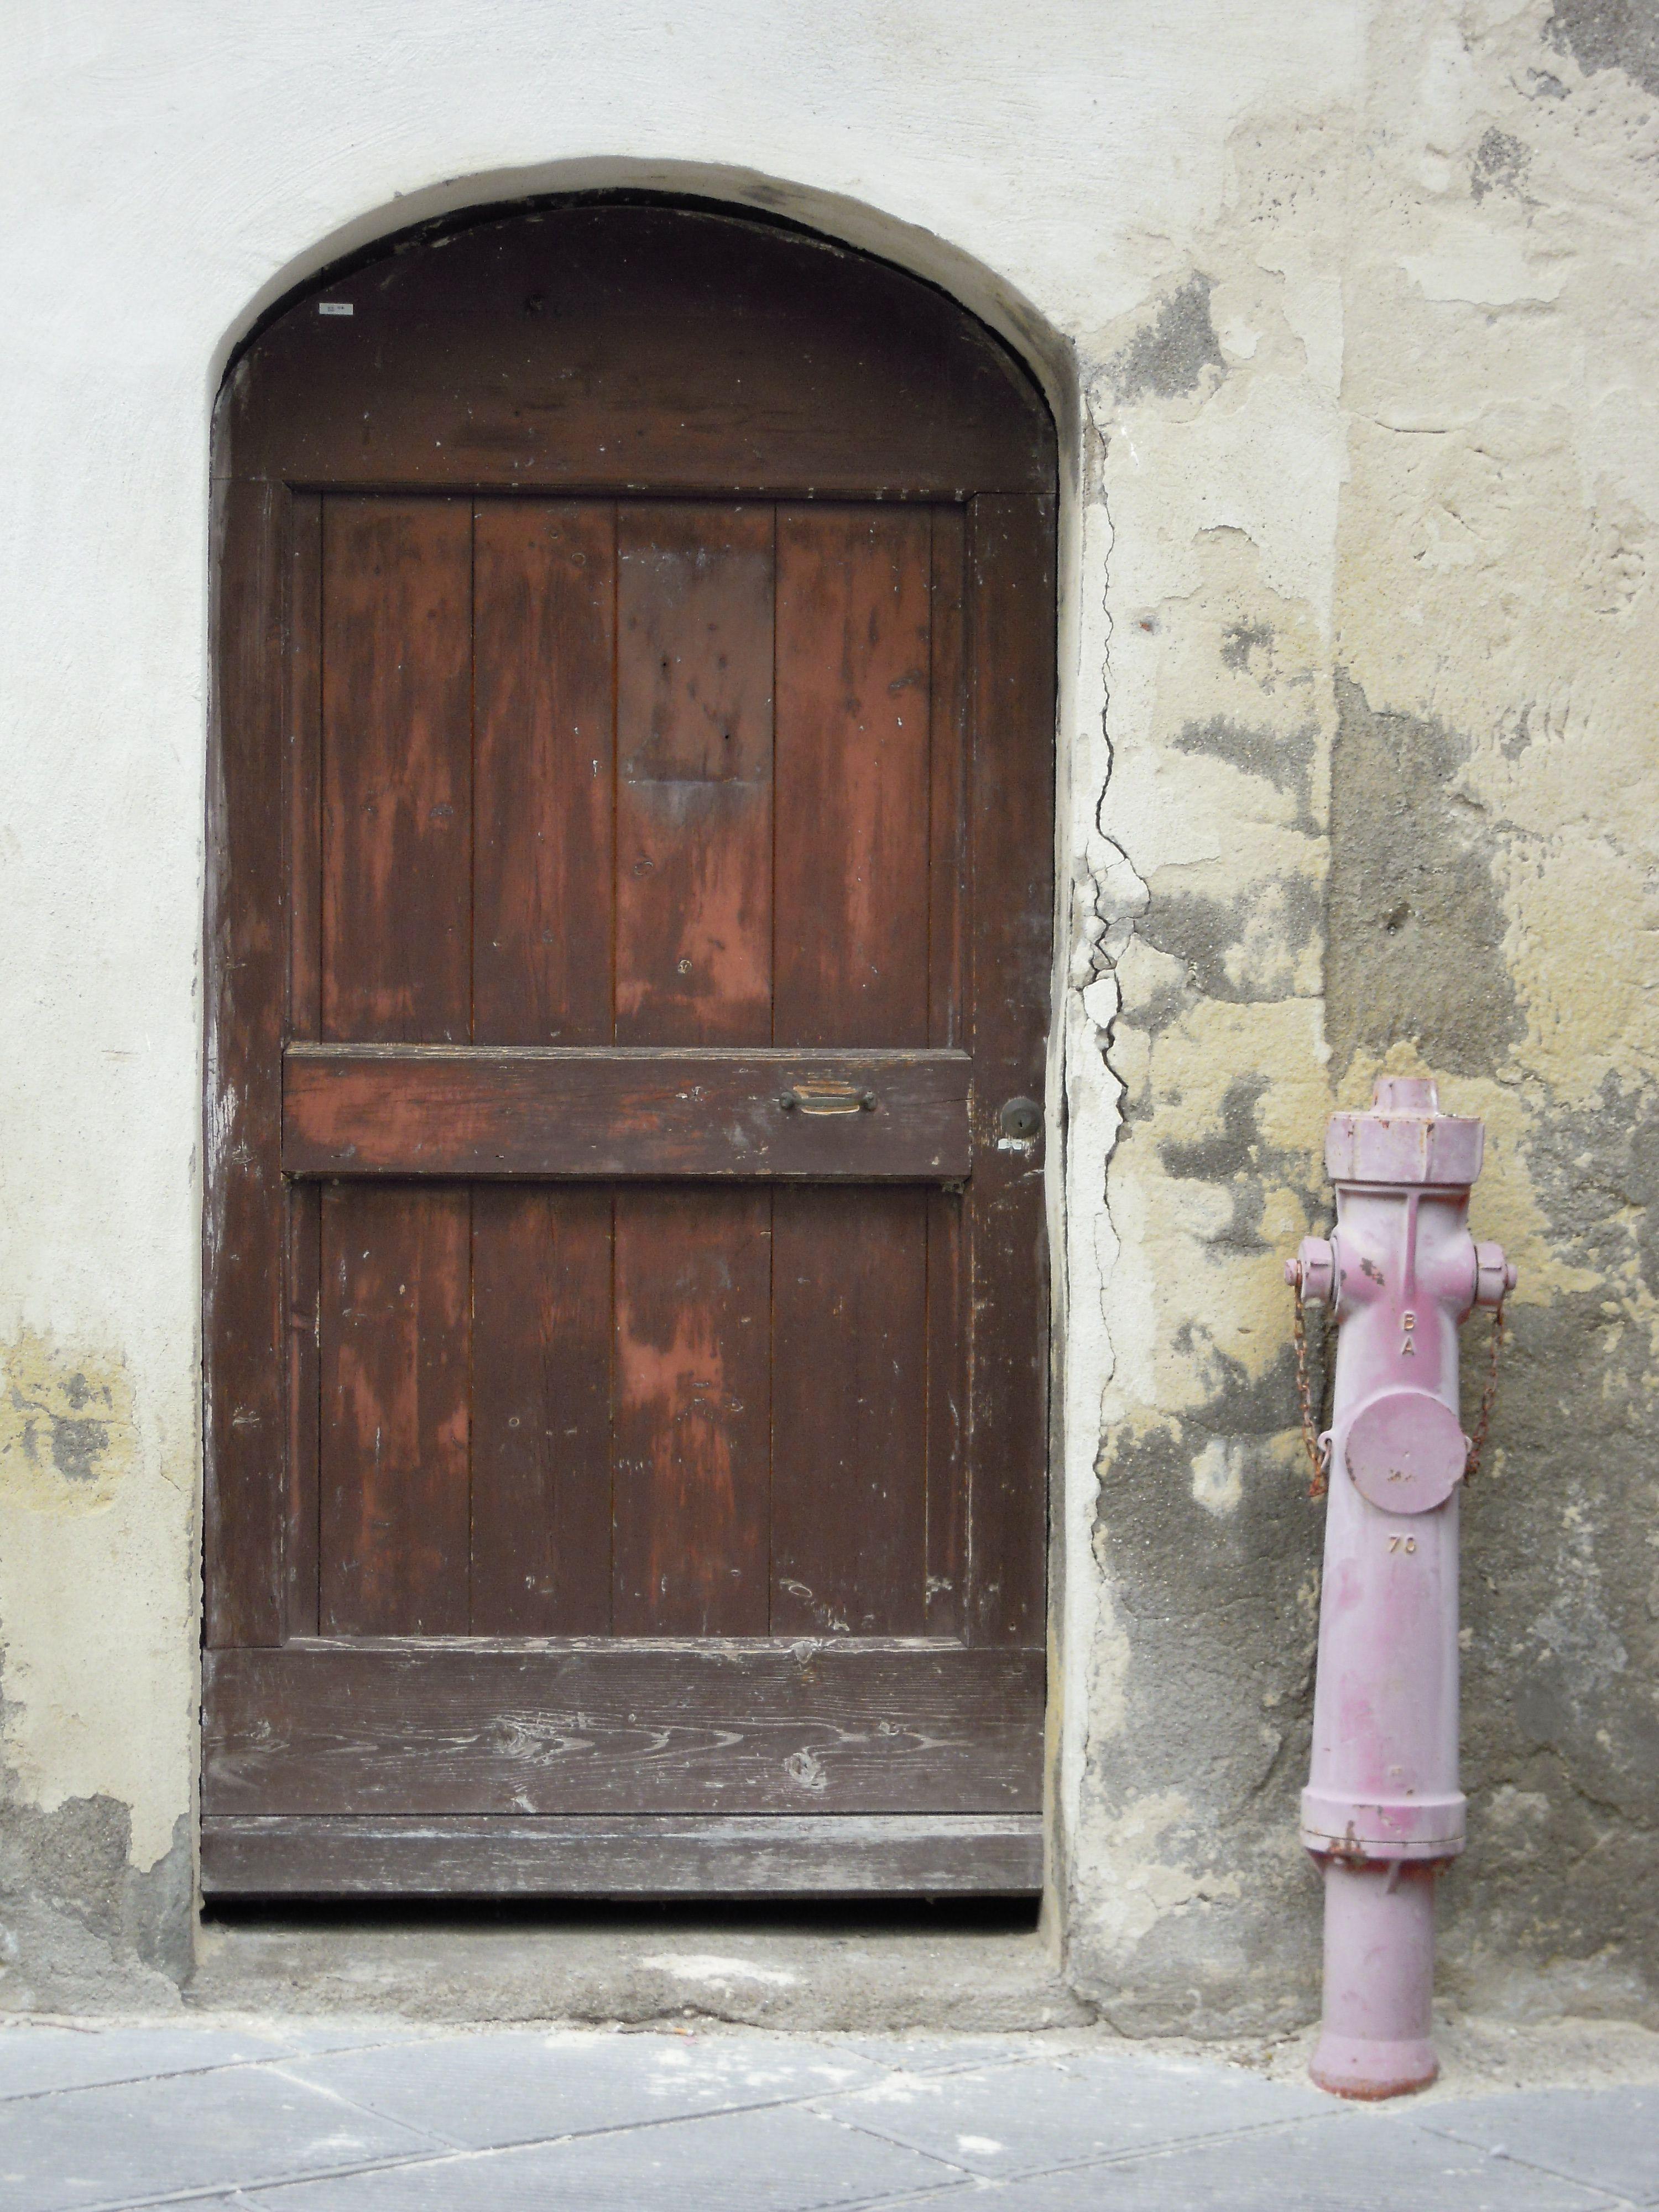 Asciano, Crete Senesi, Siena, Toscana.